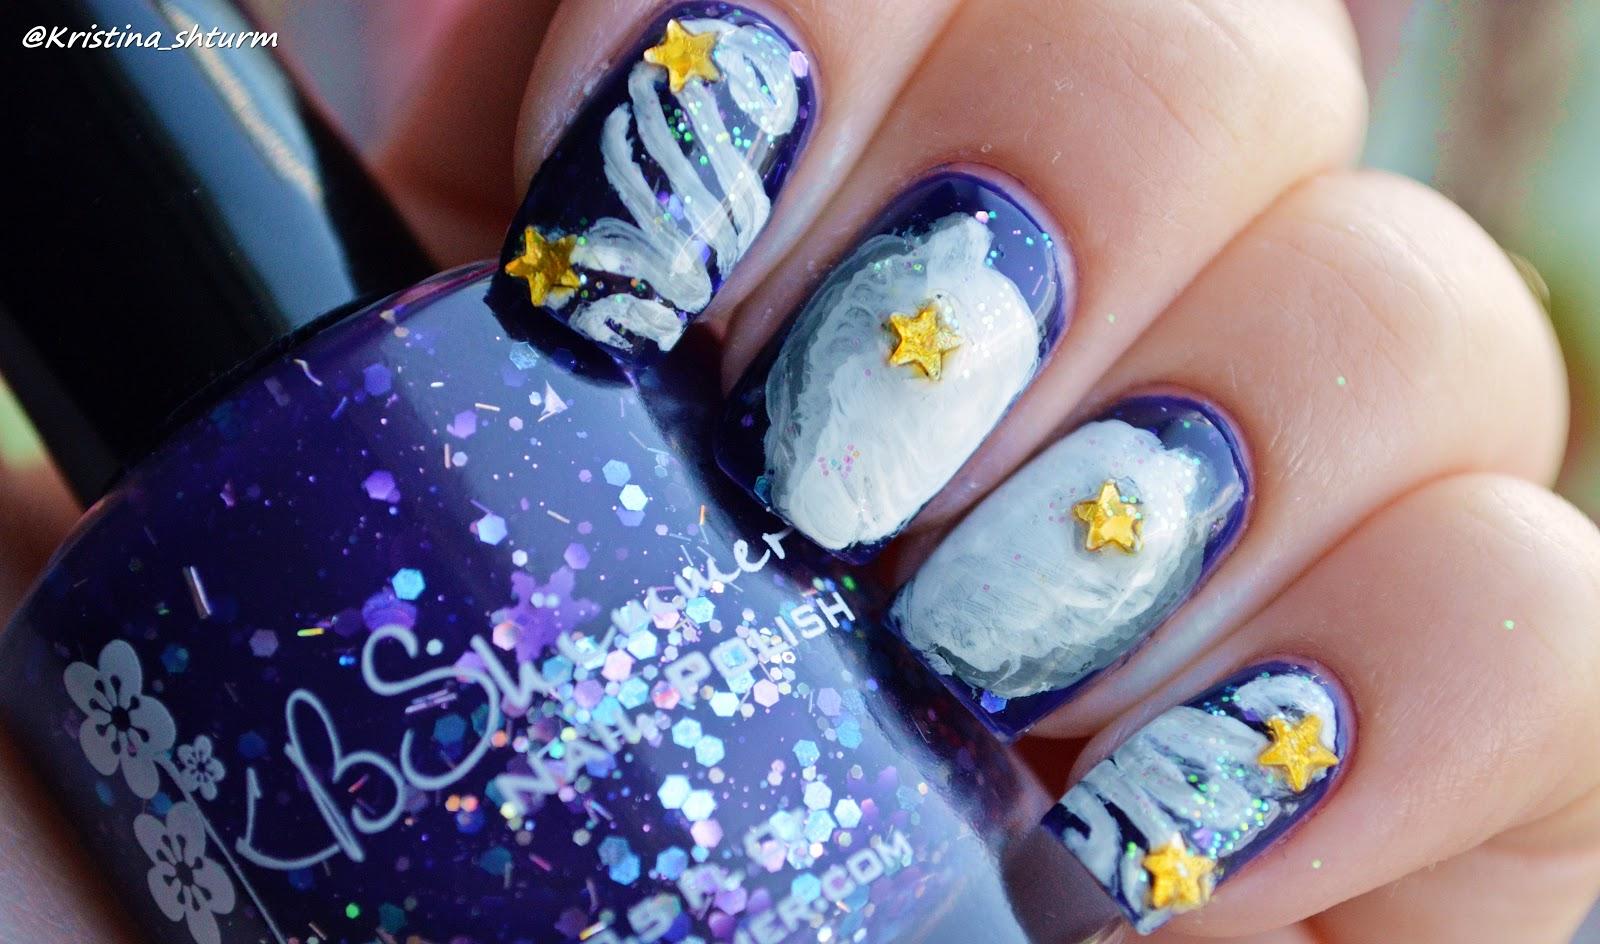 Знаки зодиака на ногтях маникюр